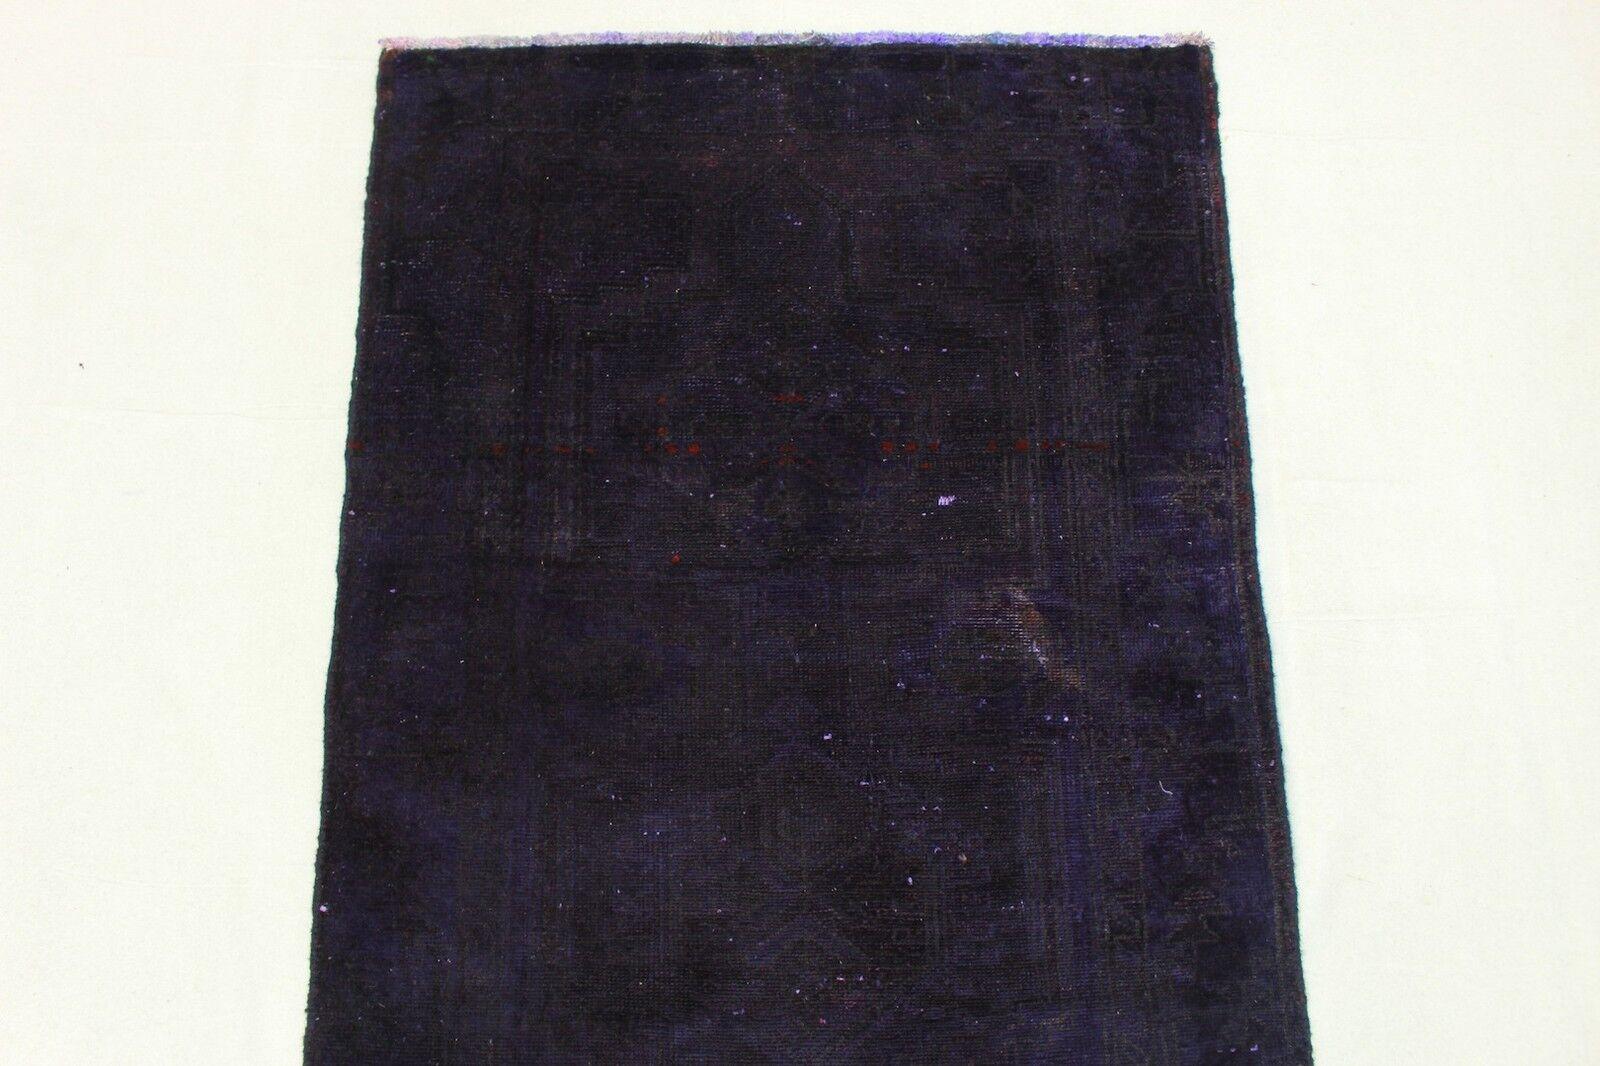 Orient Teppich Vintage modern modern modern Used Look lila 280x90 Läufer handgeknüpft 2818a 80294a